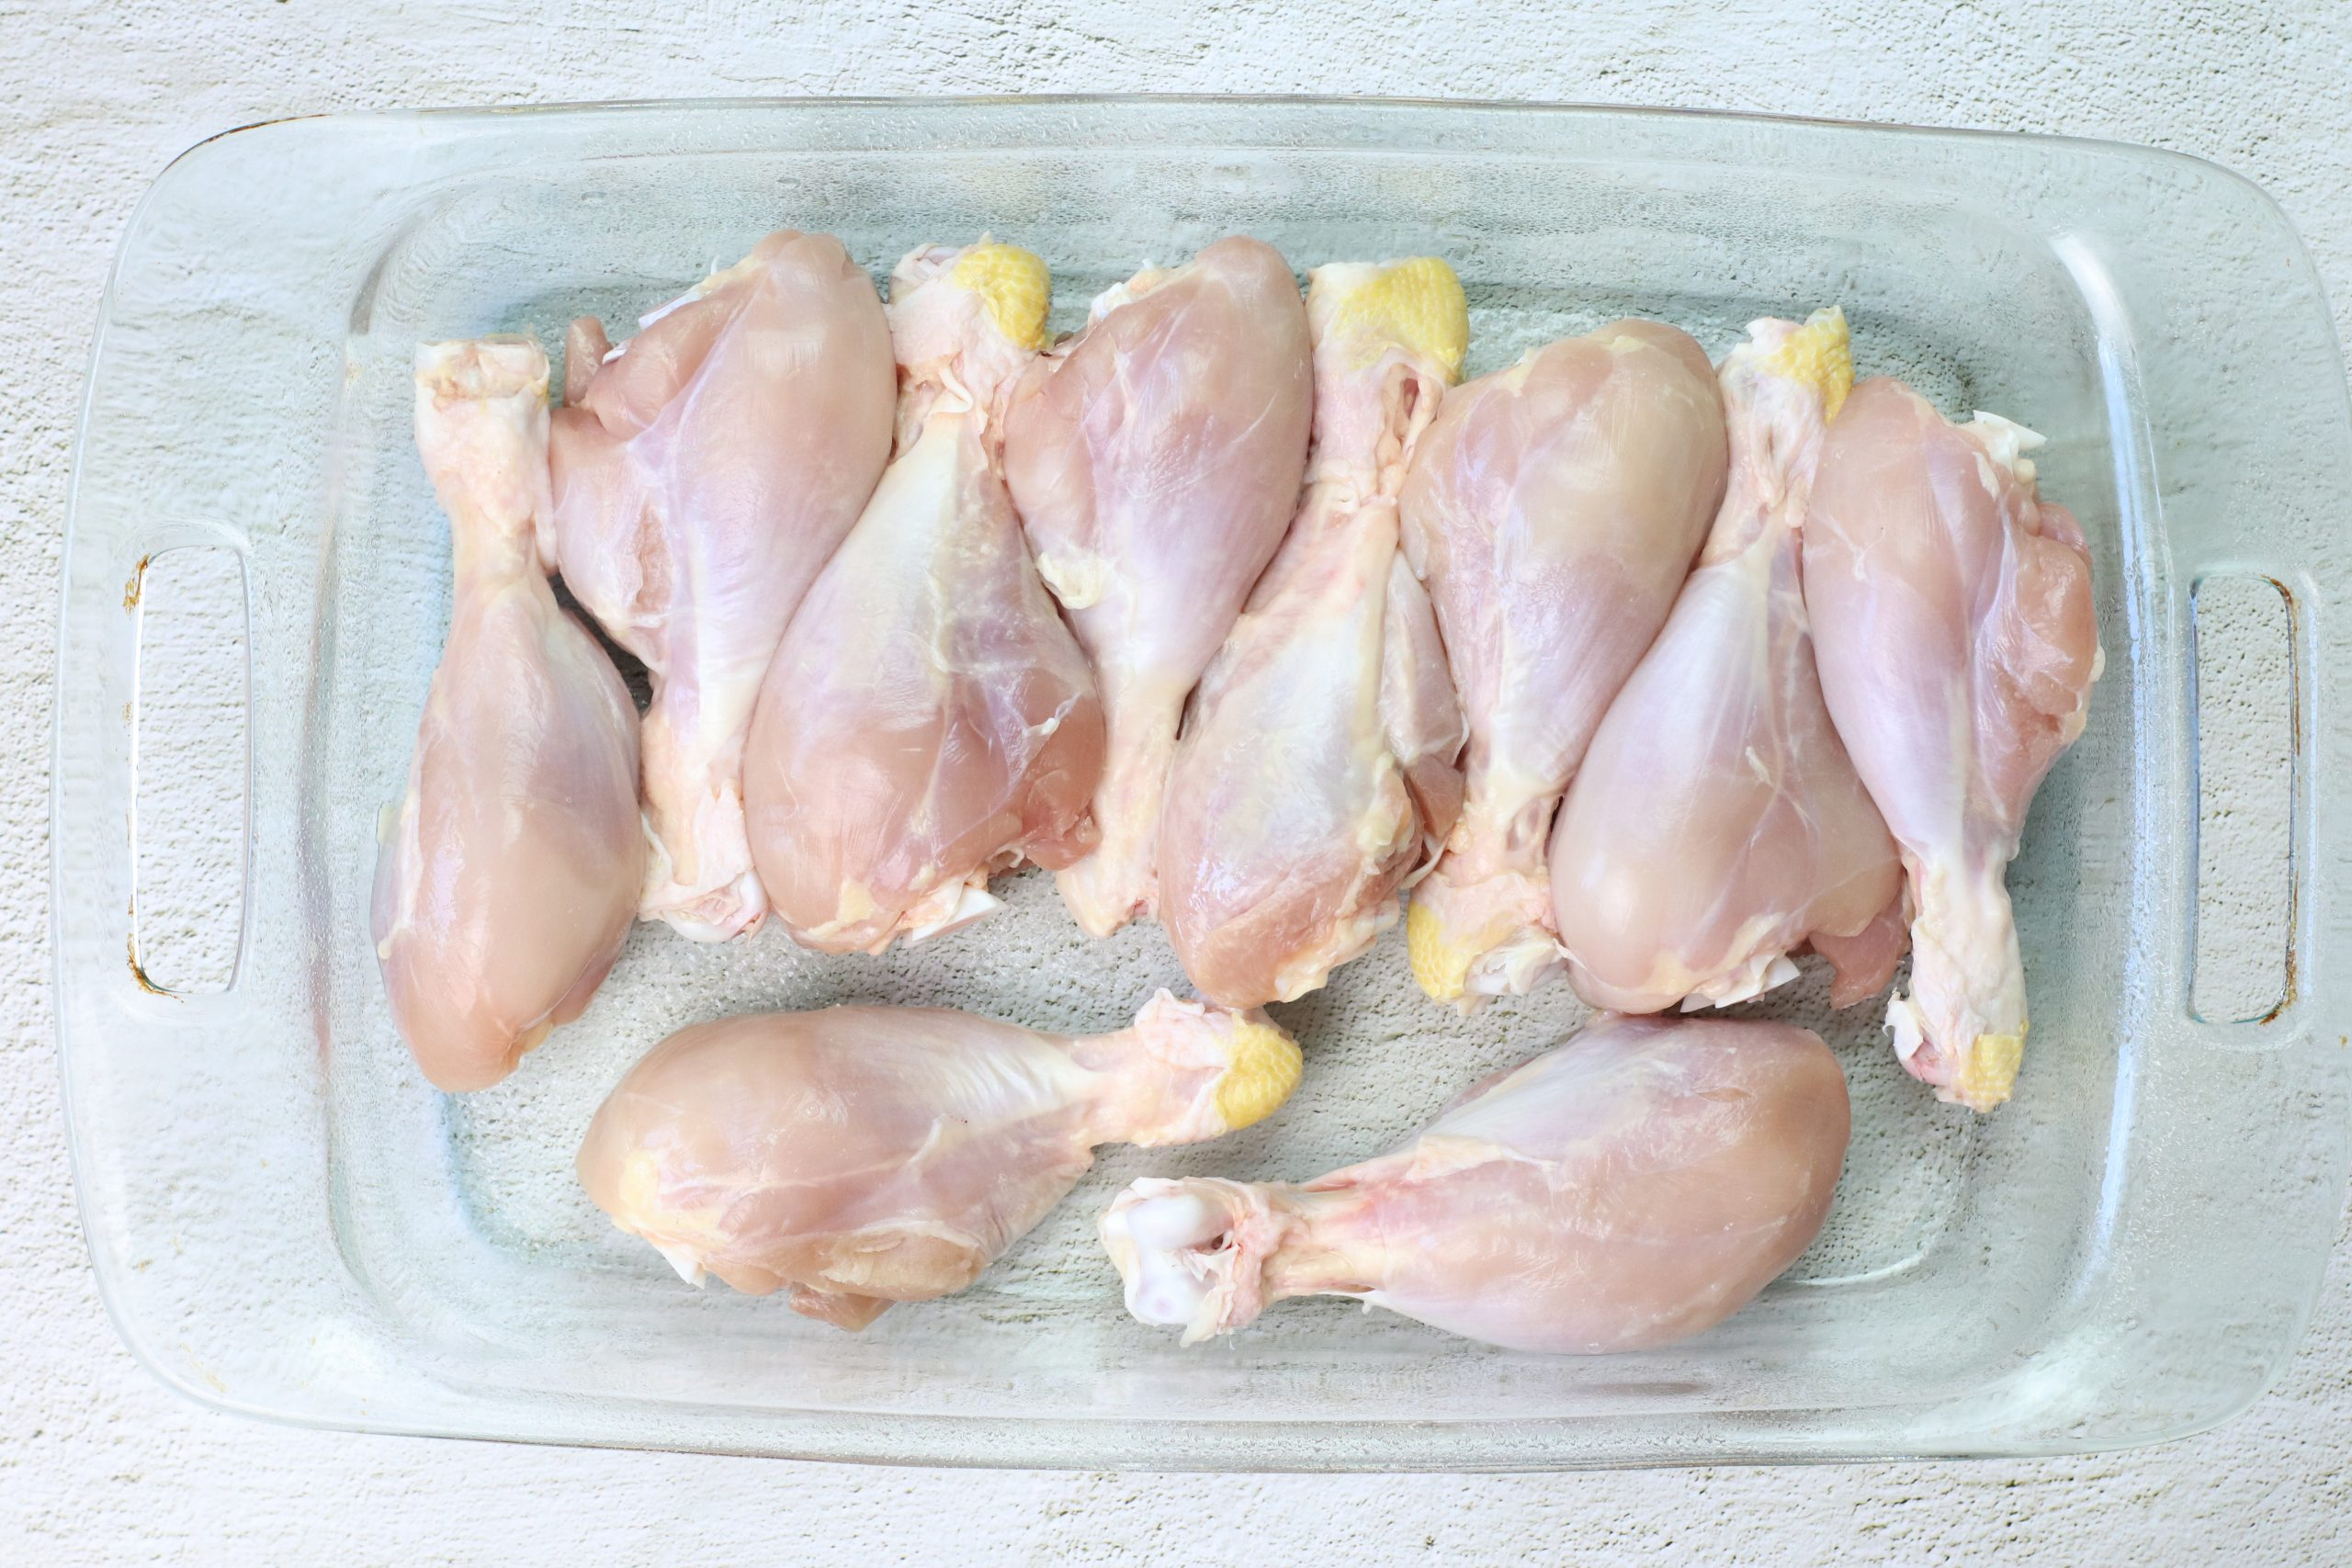 raw chicken in a baking dish